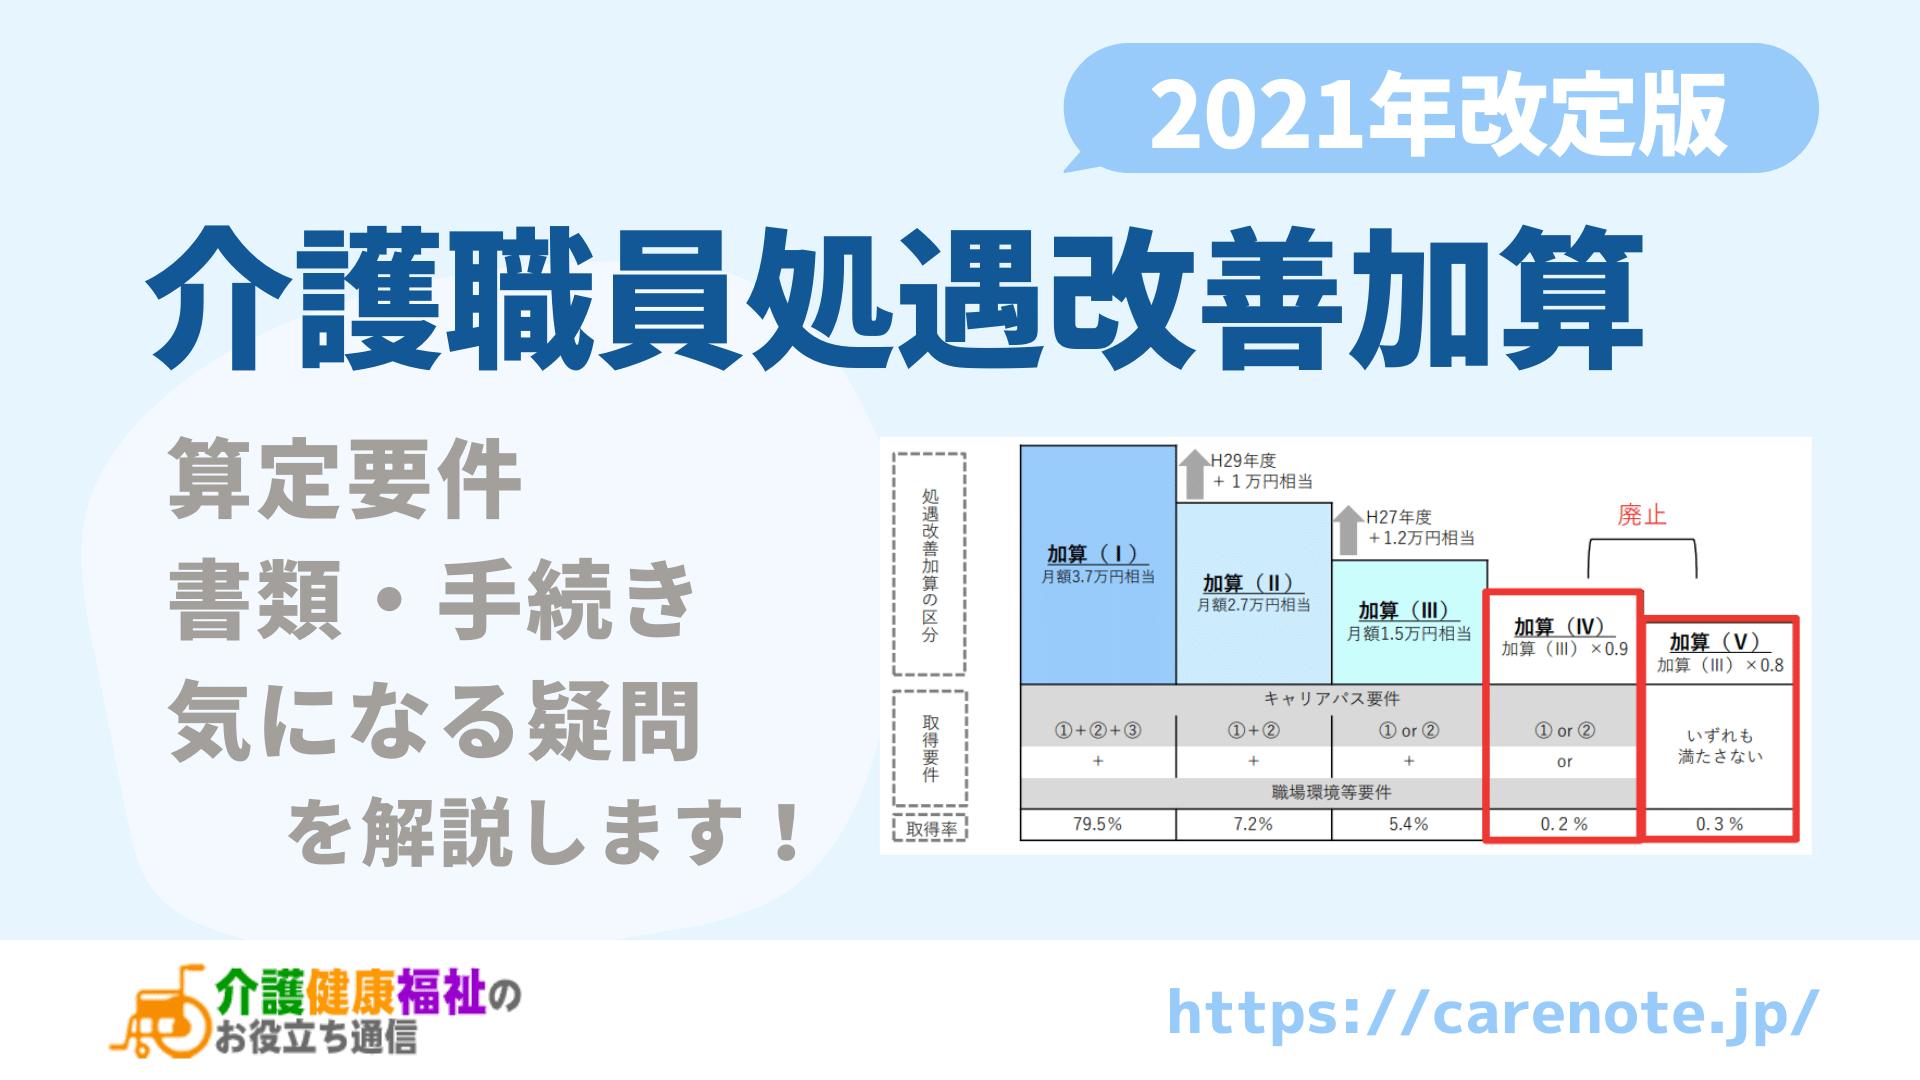 2021年版 介護職員処遇改善加算の書類・手続きを解説